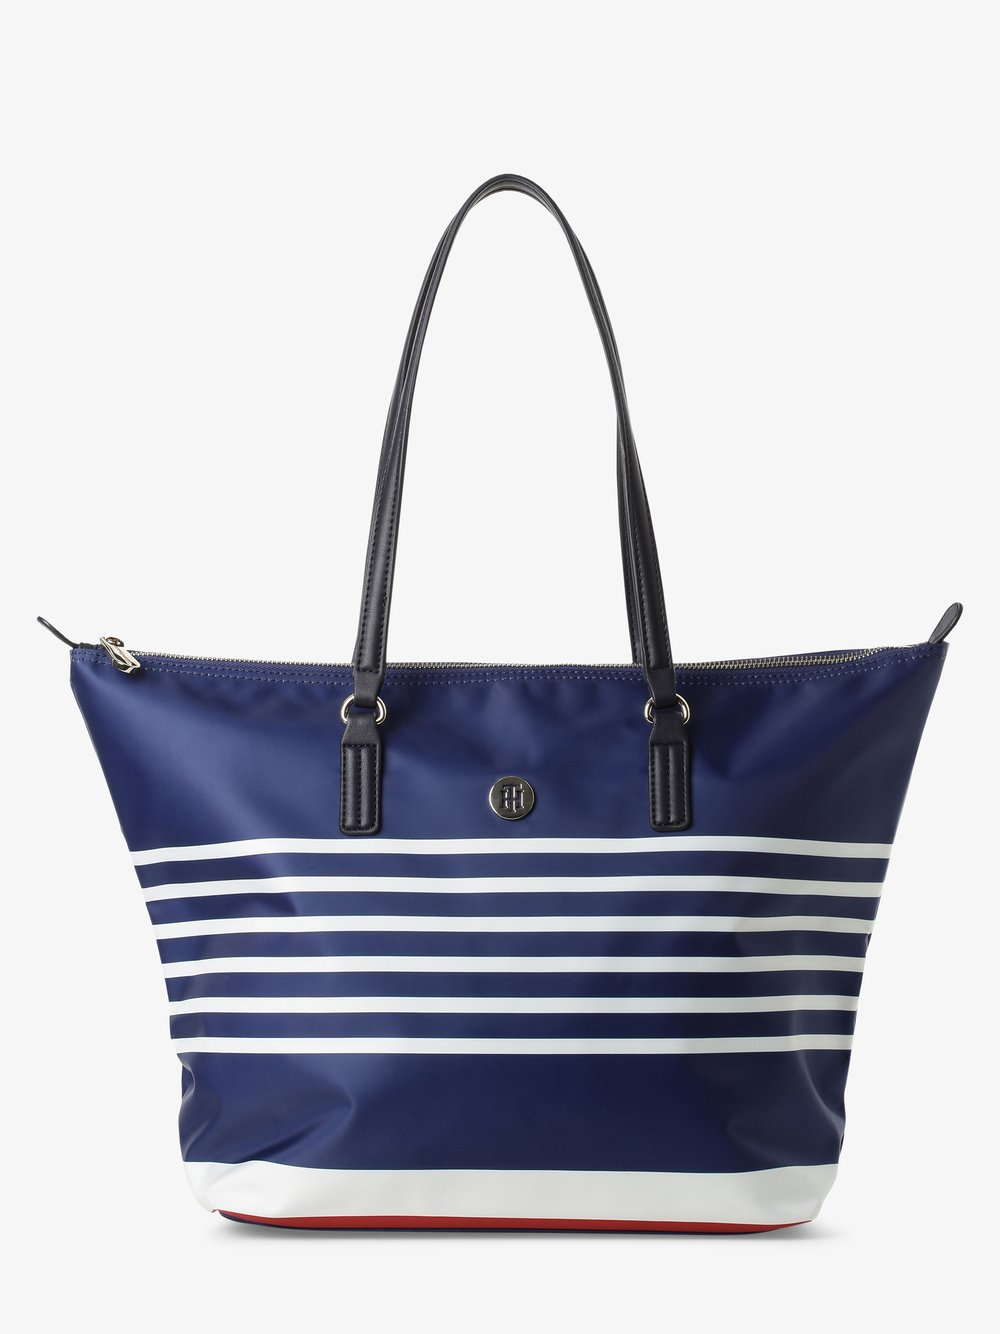 Tommy Hilfiger - Damska torba shopper, niebieski